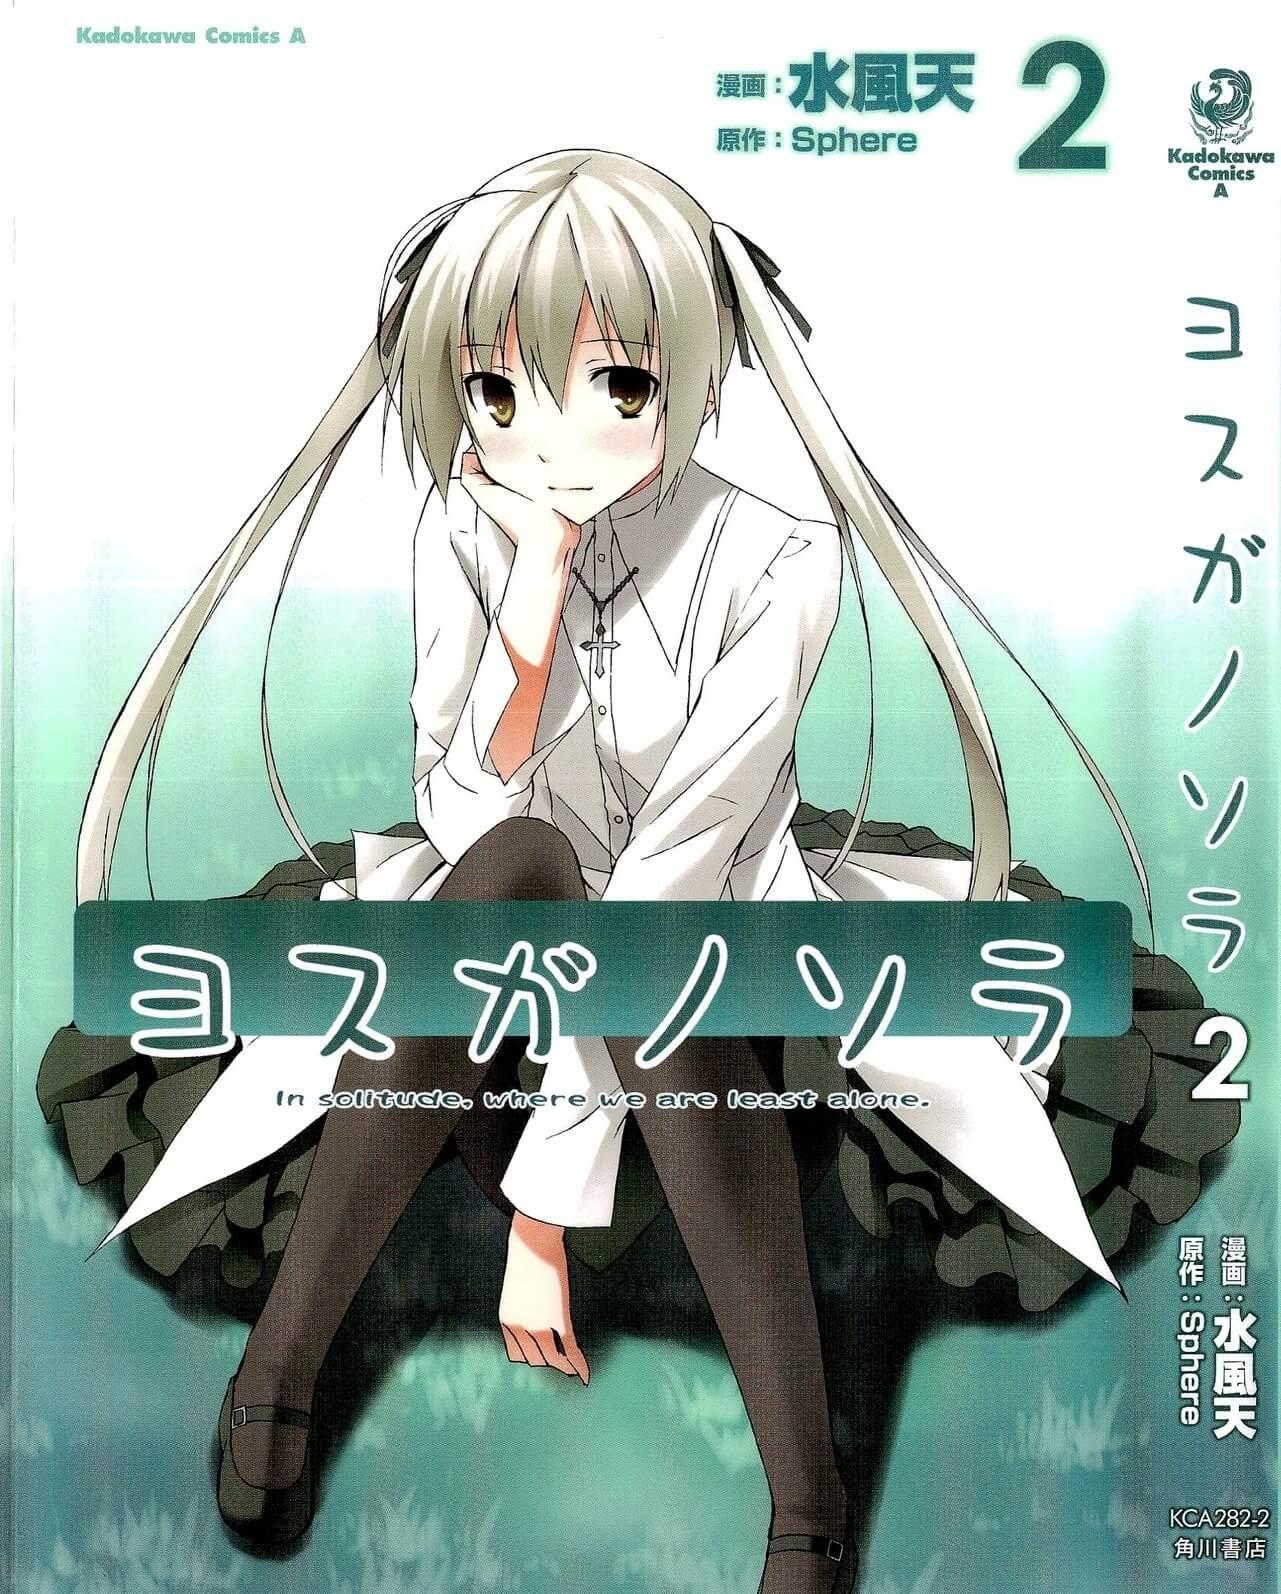 Descargar manga de Yosuga no Sora en PDF por Mediafire